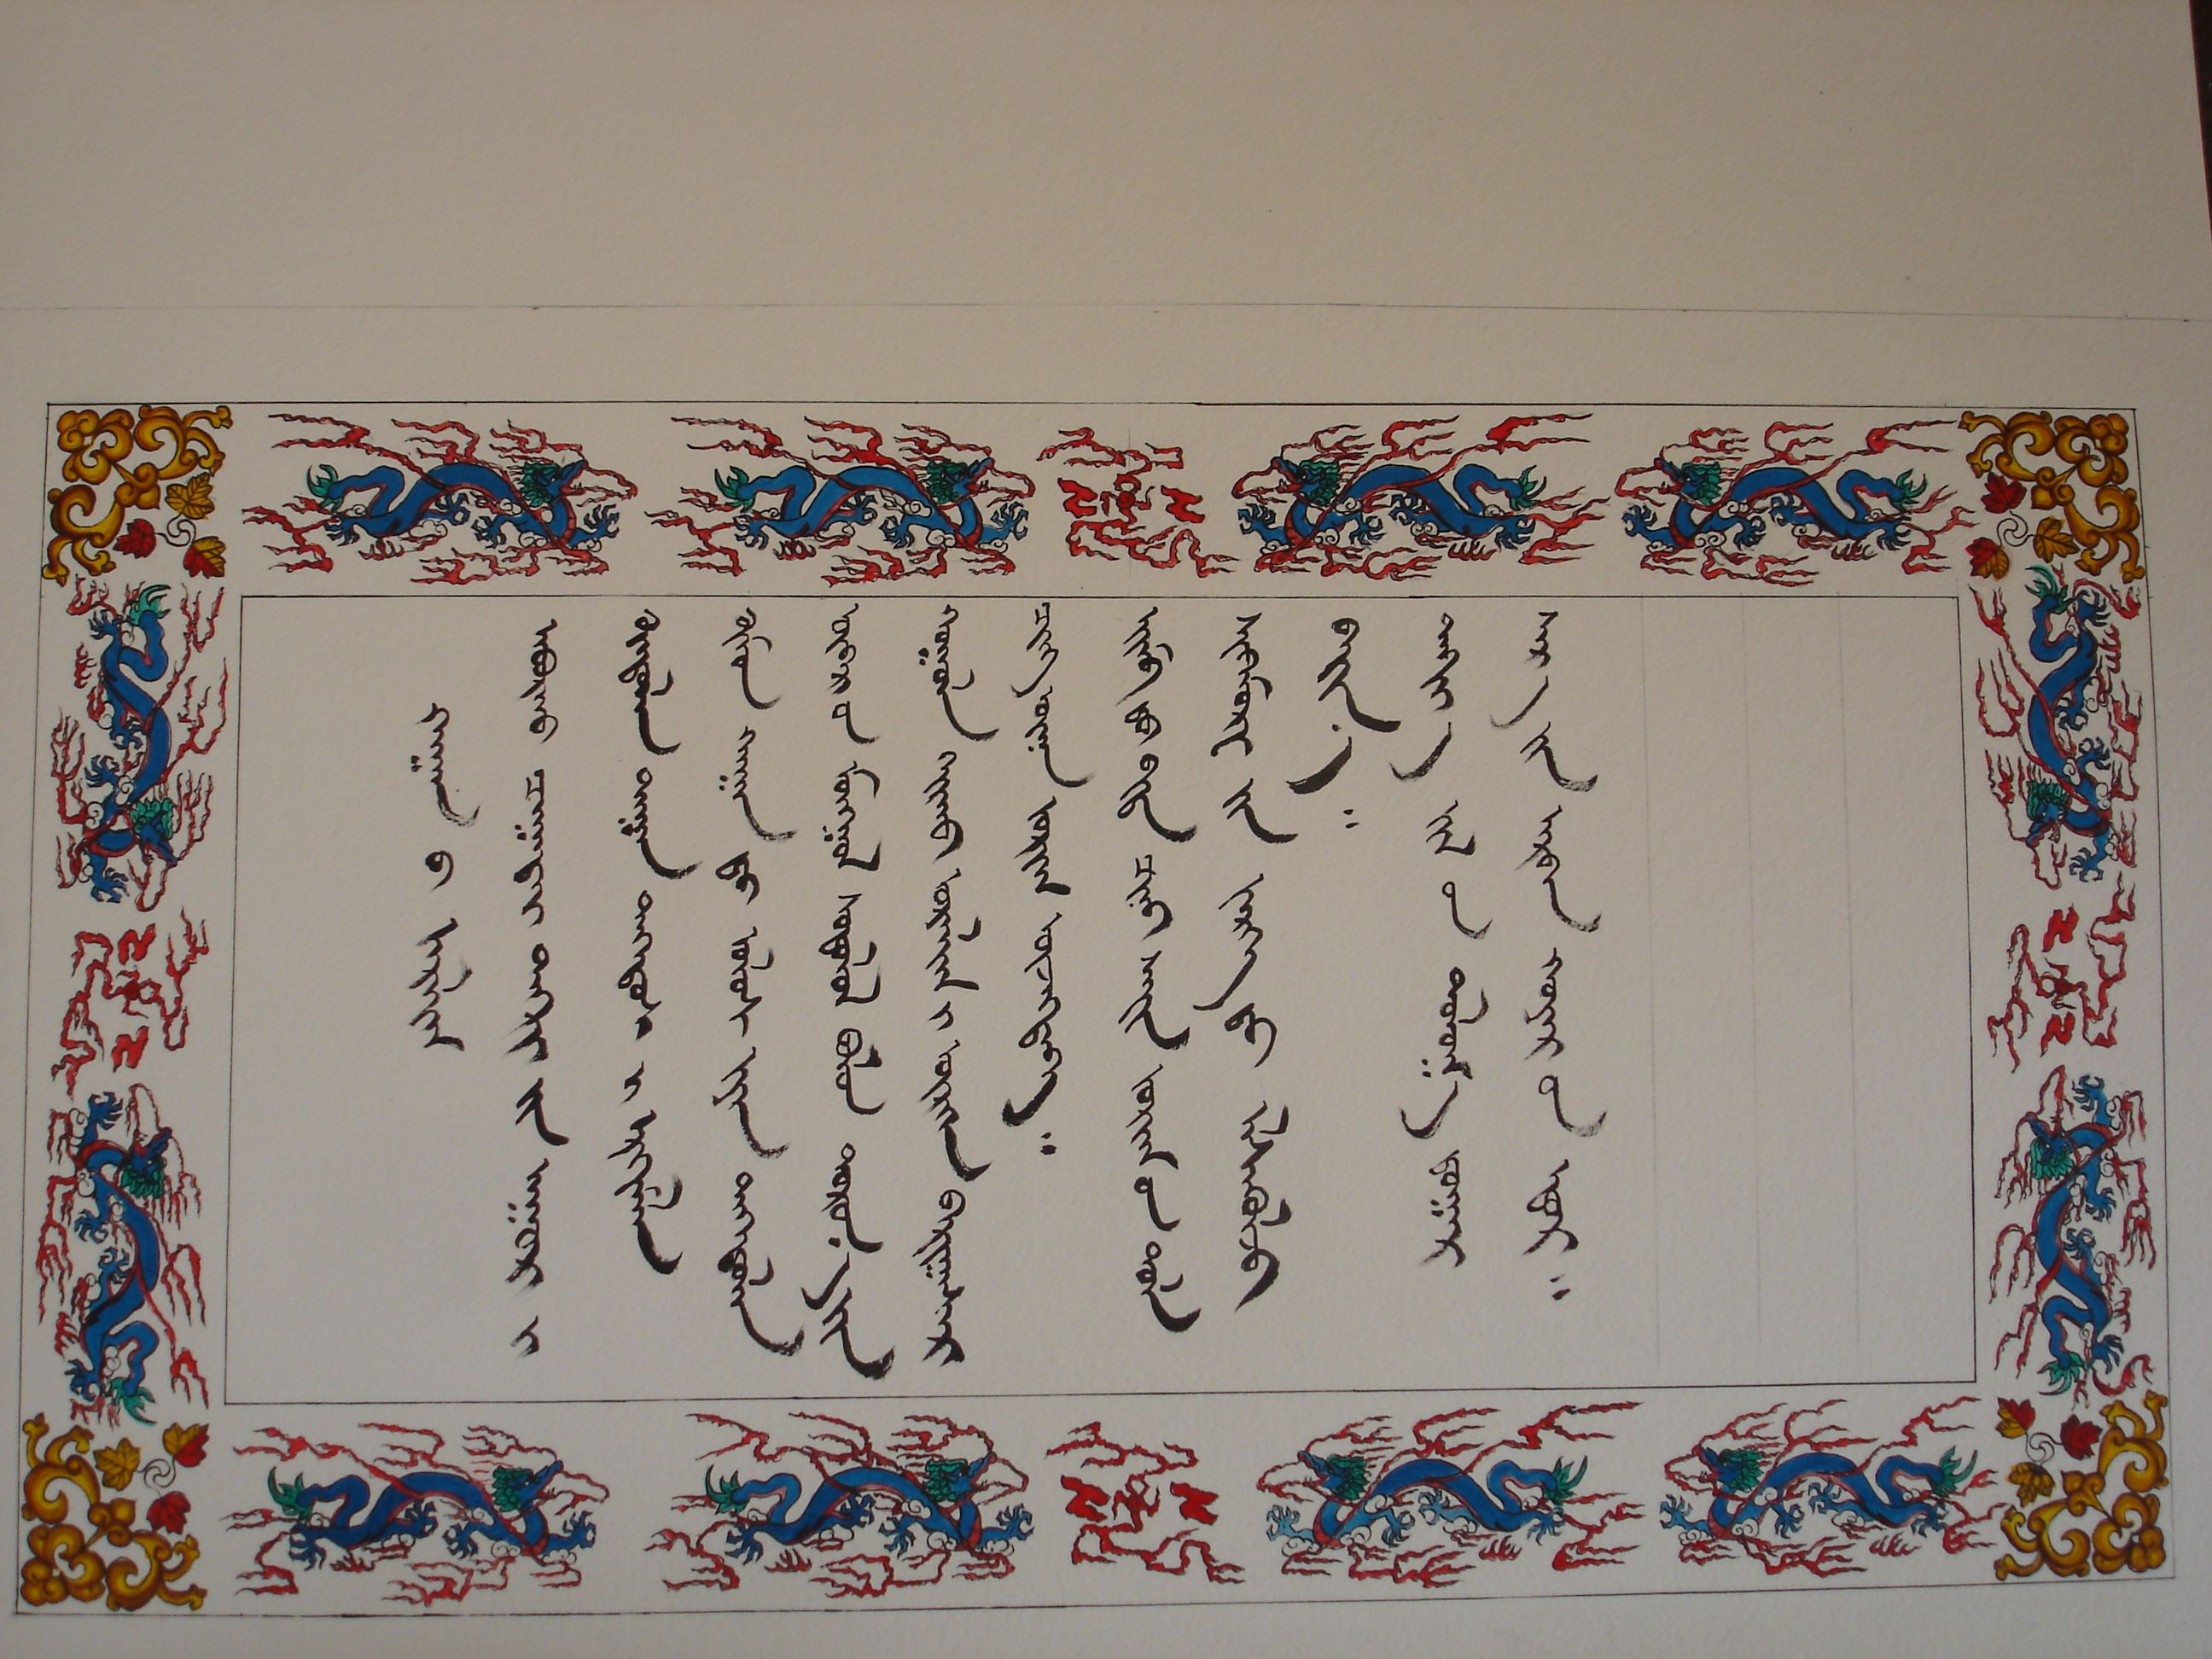 Sca calligraphy